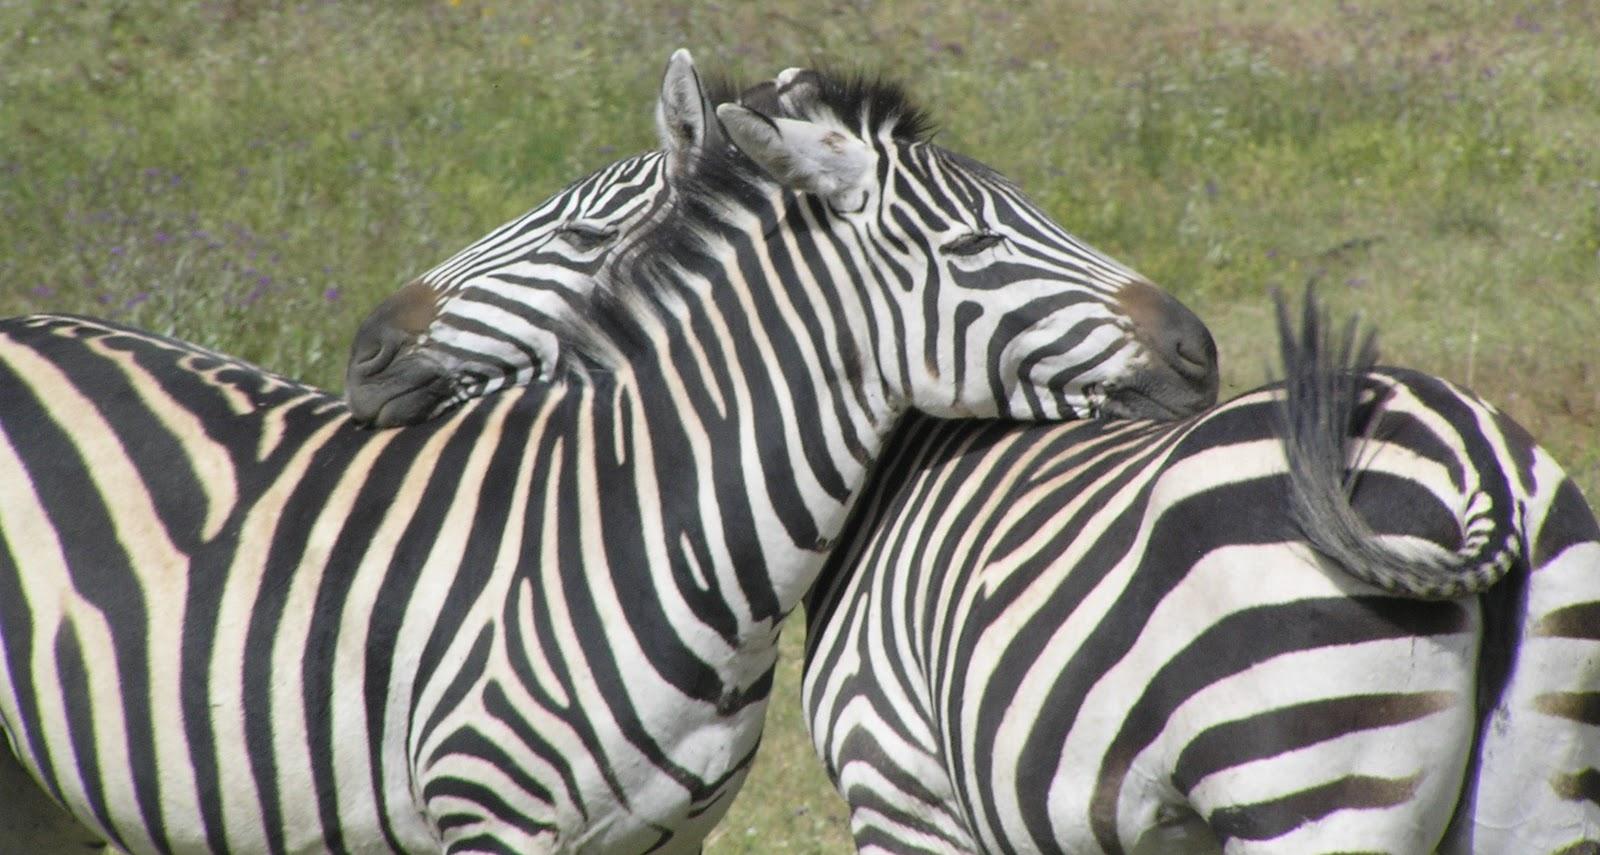 Rwanda On The Wing Zebras Rhinos And Giraffes Oh My A